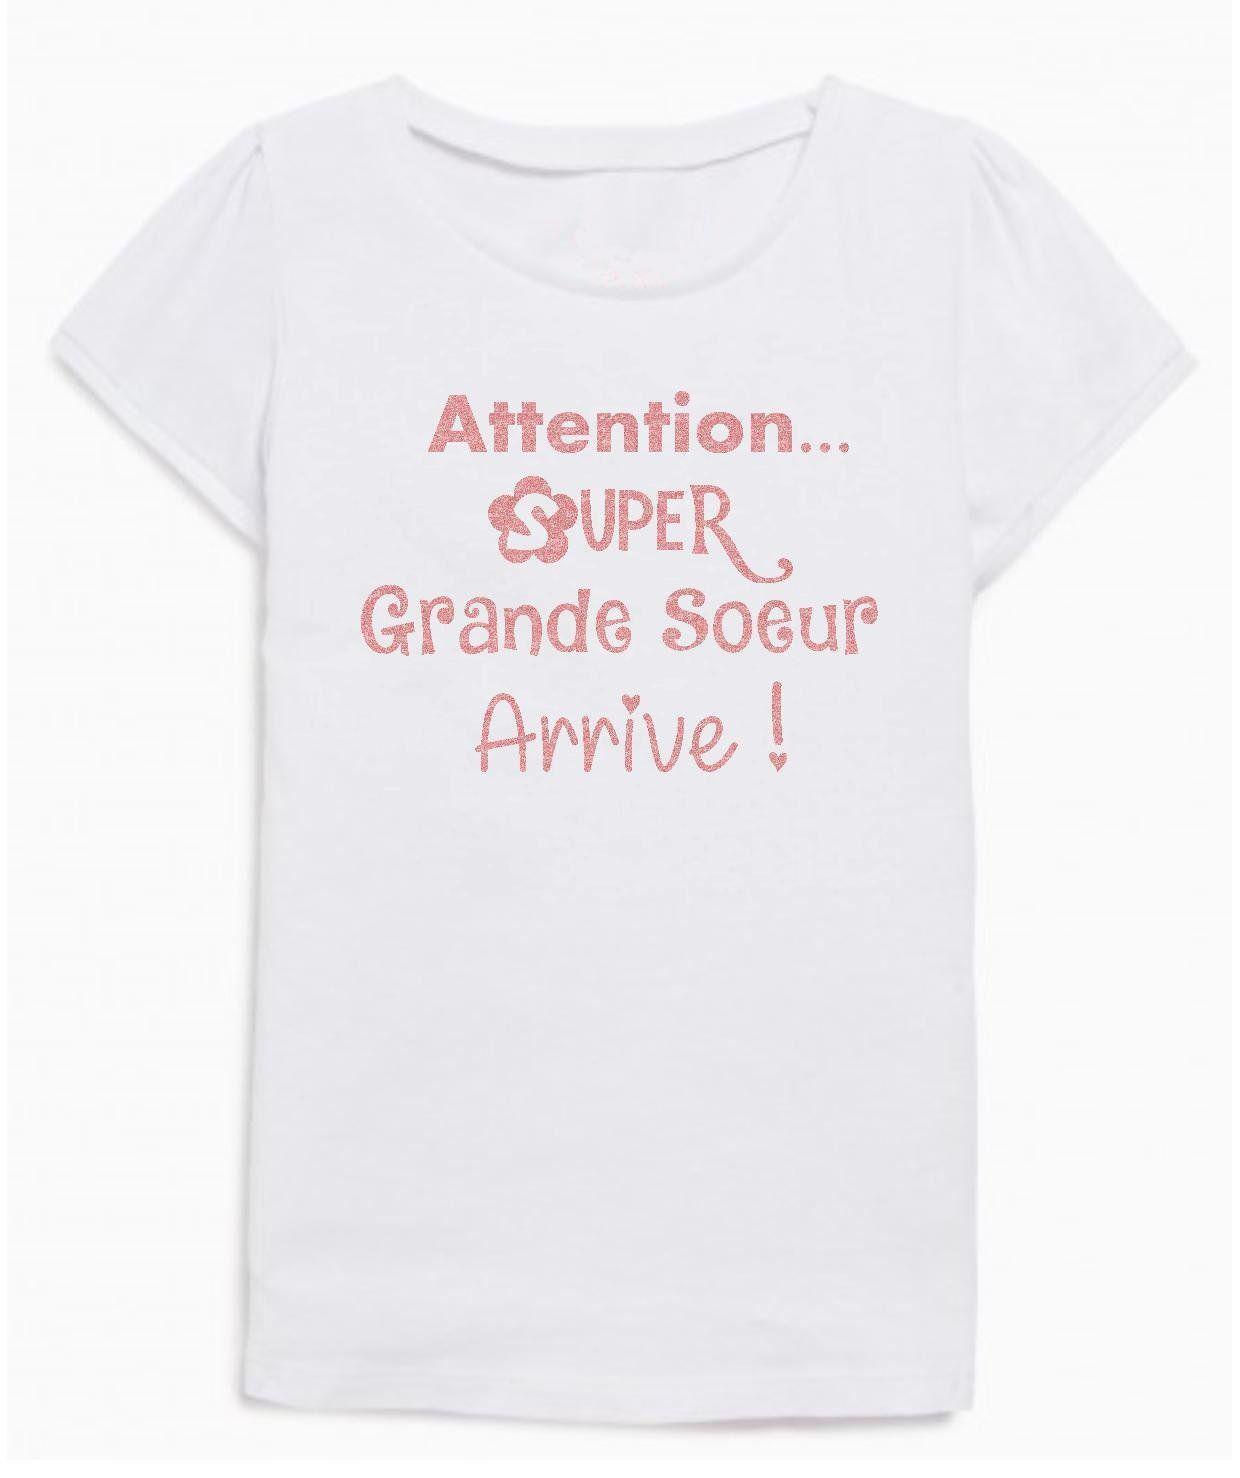 Future Grande Soeur Tee Shirt G Tee Shirt Personnalisécadeau